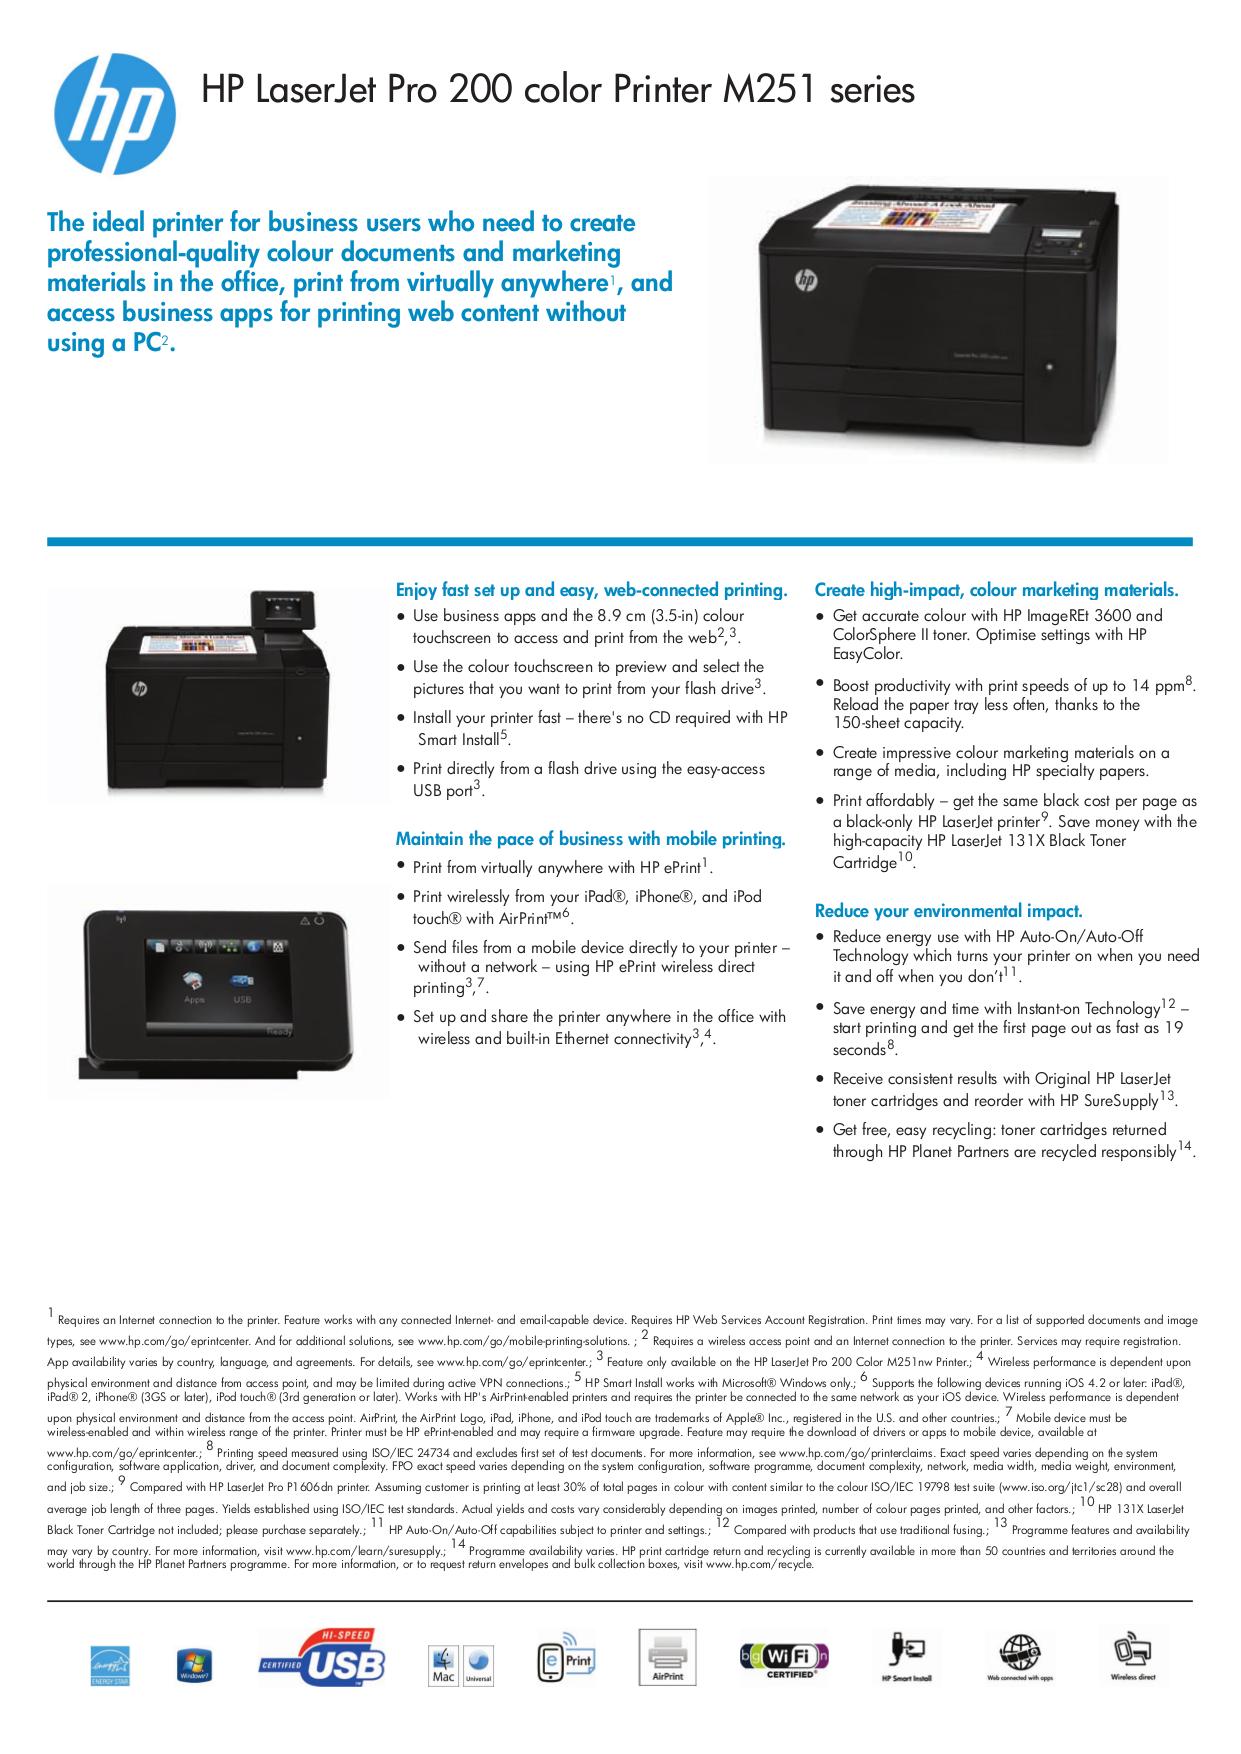 download free pdf for hp laserjet color laserjet pro p1606dn printer rh umlib com hp laserjet pro p1606dn printer service manual hp laserjet pro p1606dn printer service manual